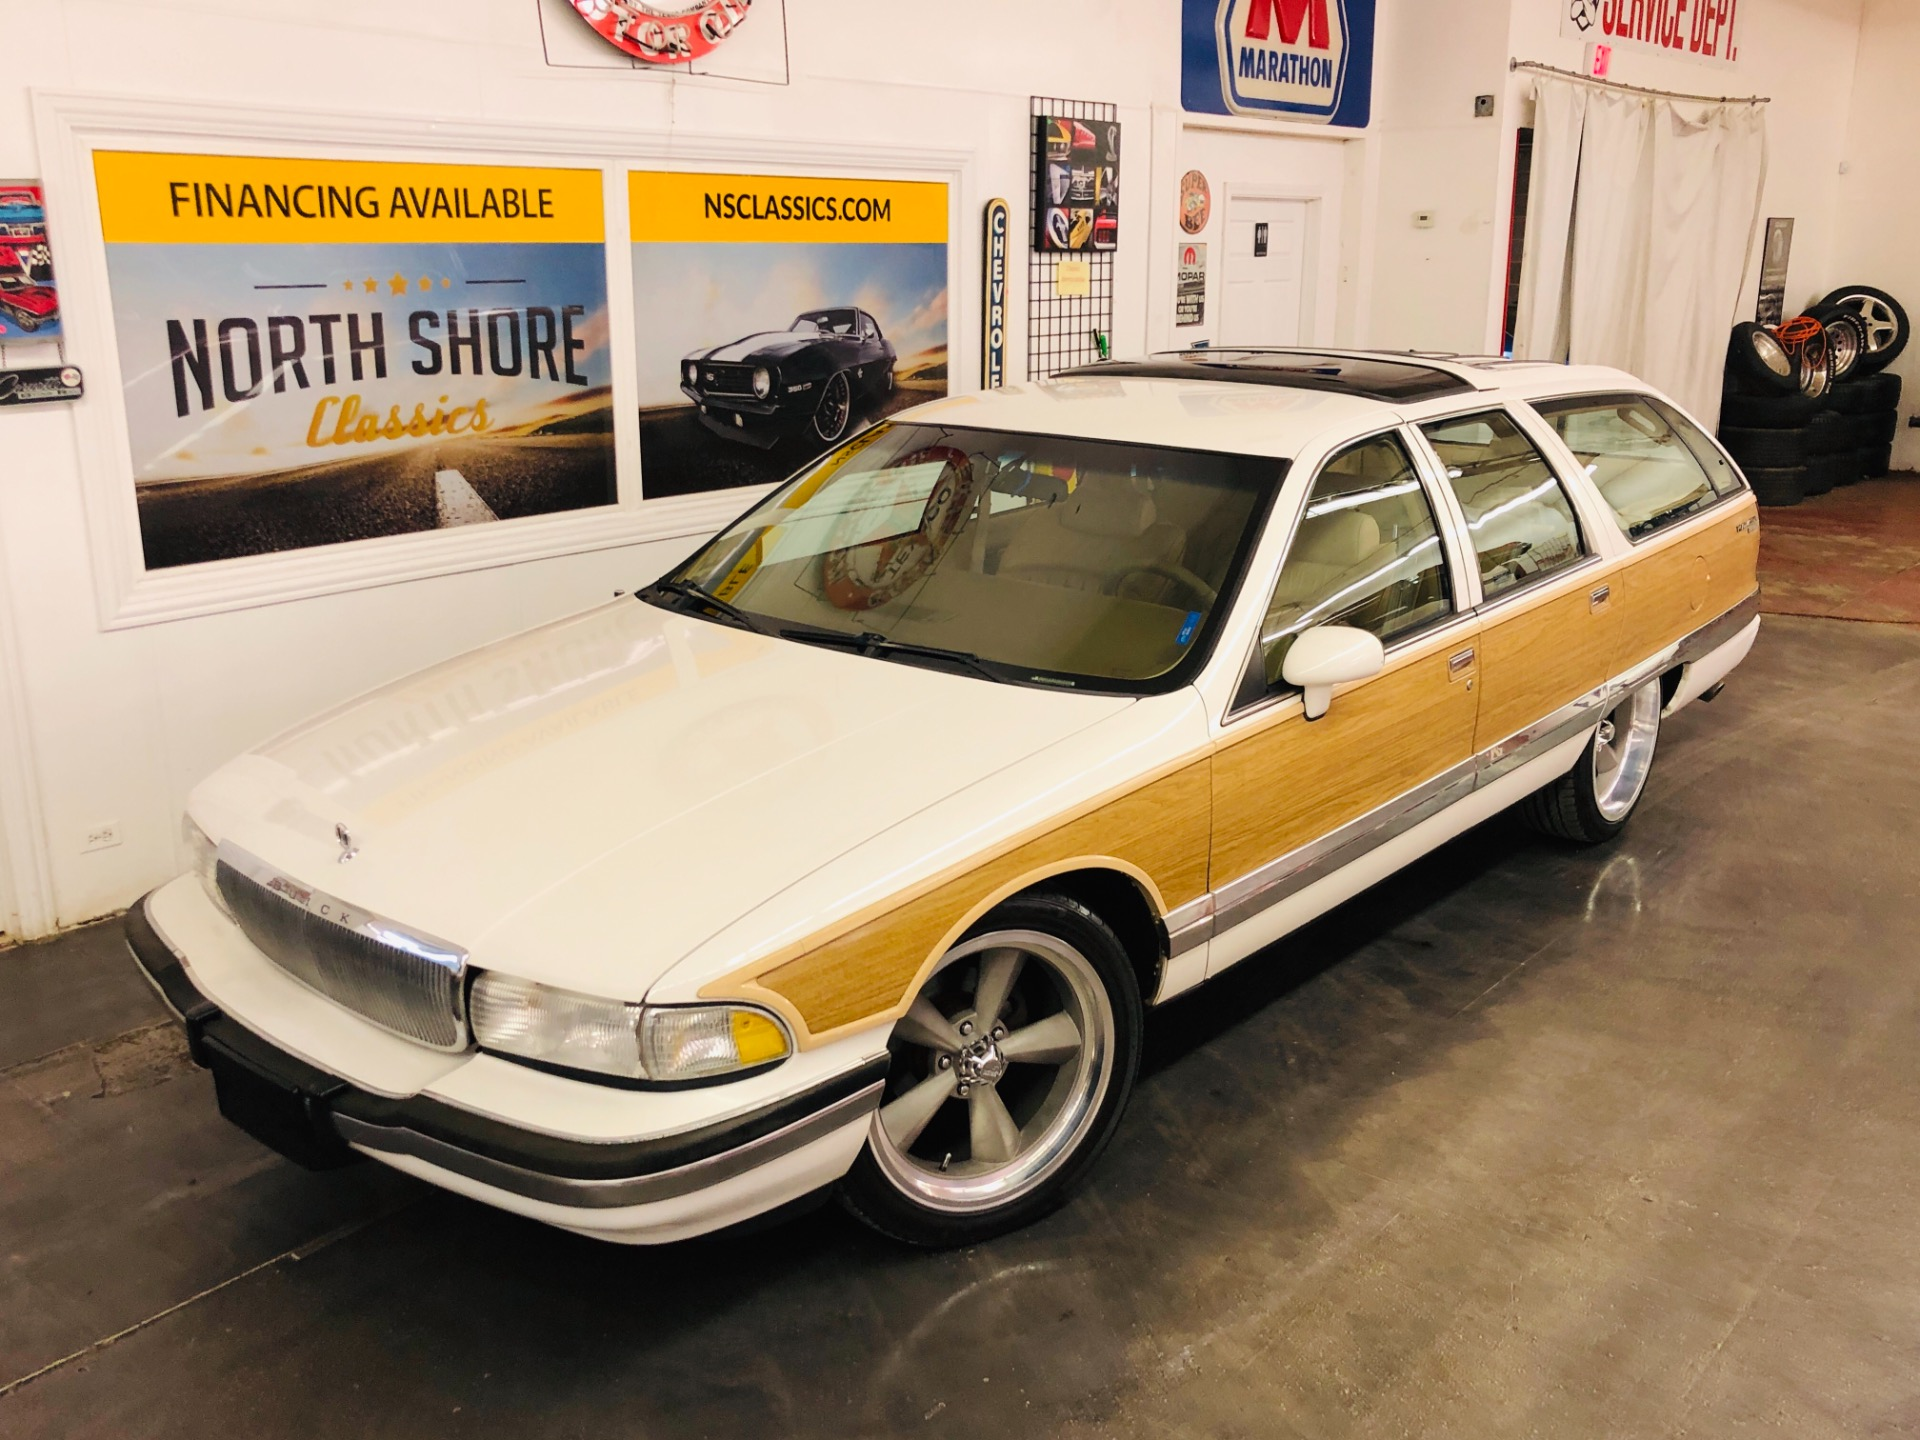 Photo 1992 Buick Roadmaster -ESTATE WAGON - FAMILY CRUISER - COLD AC - LOW MILES